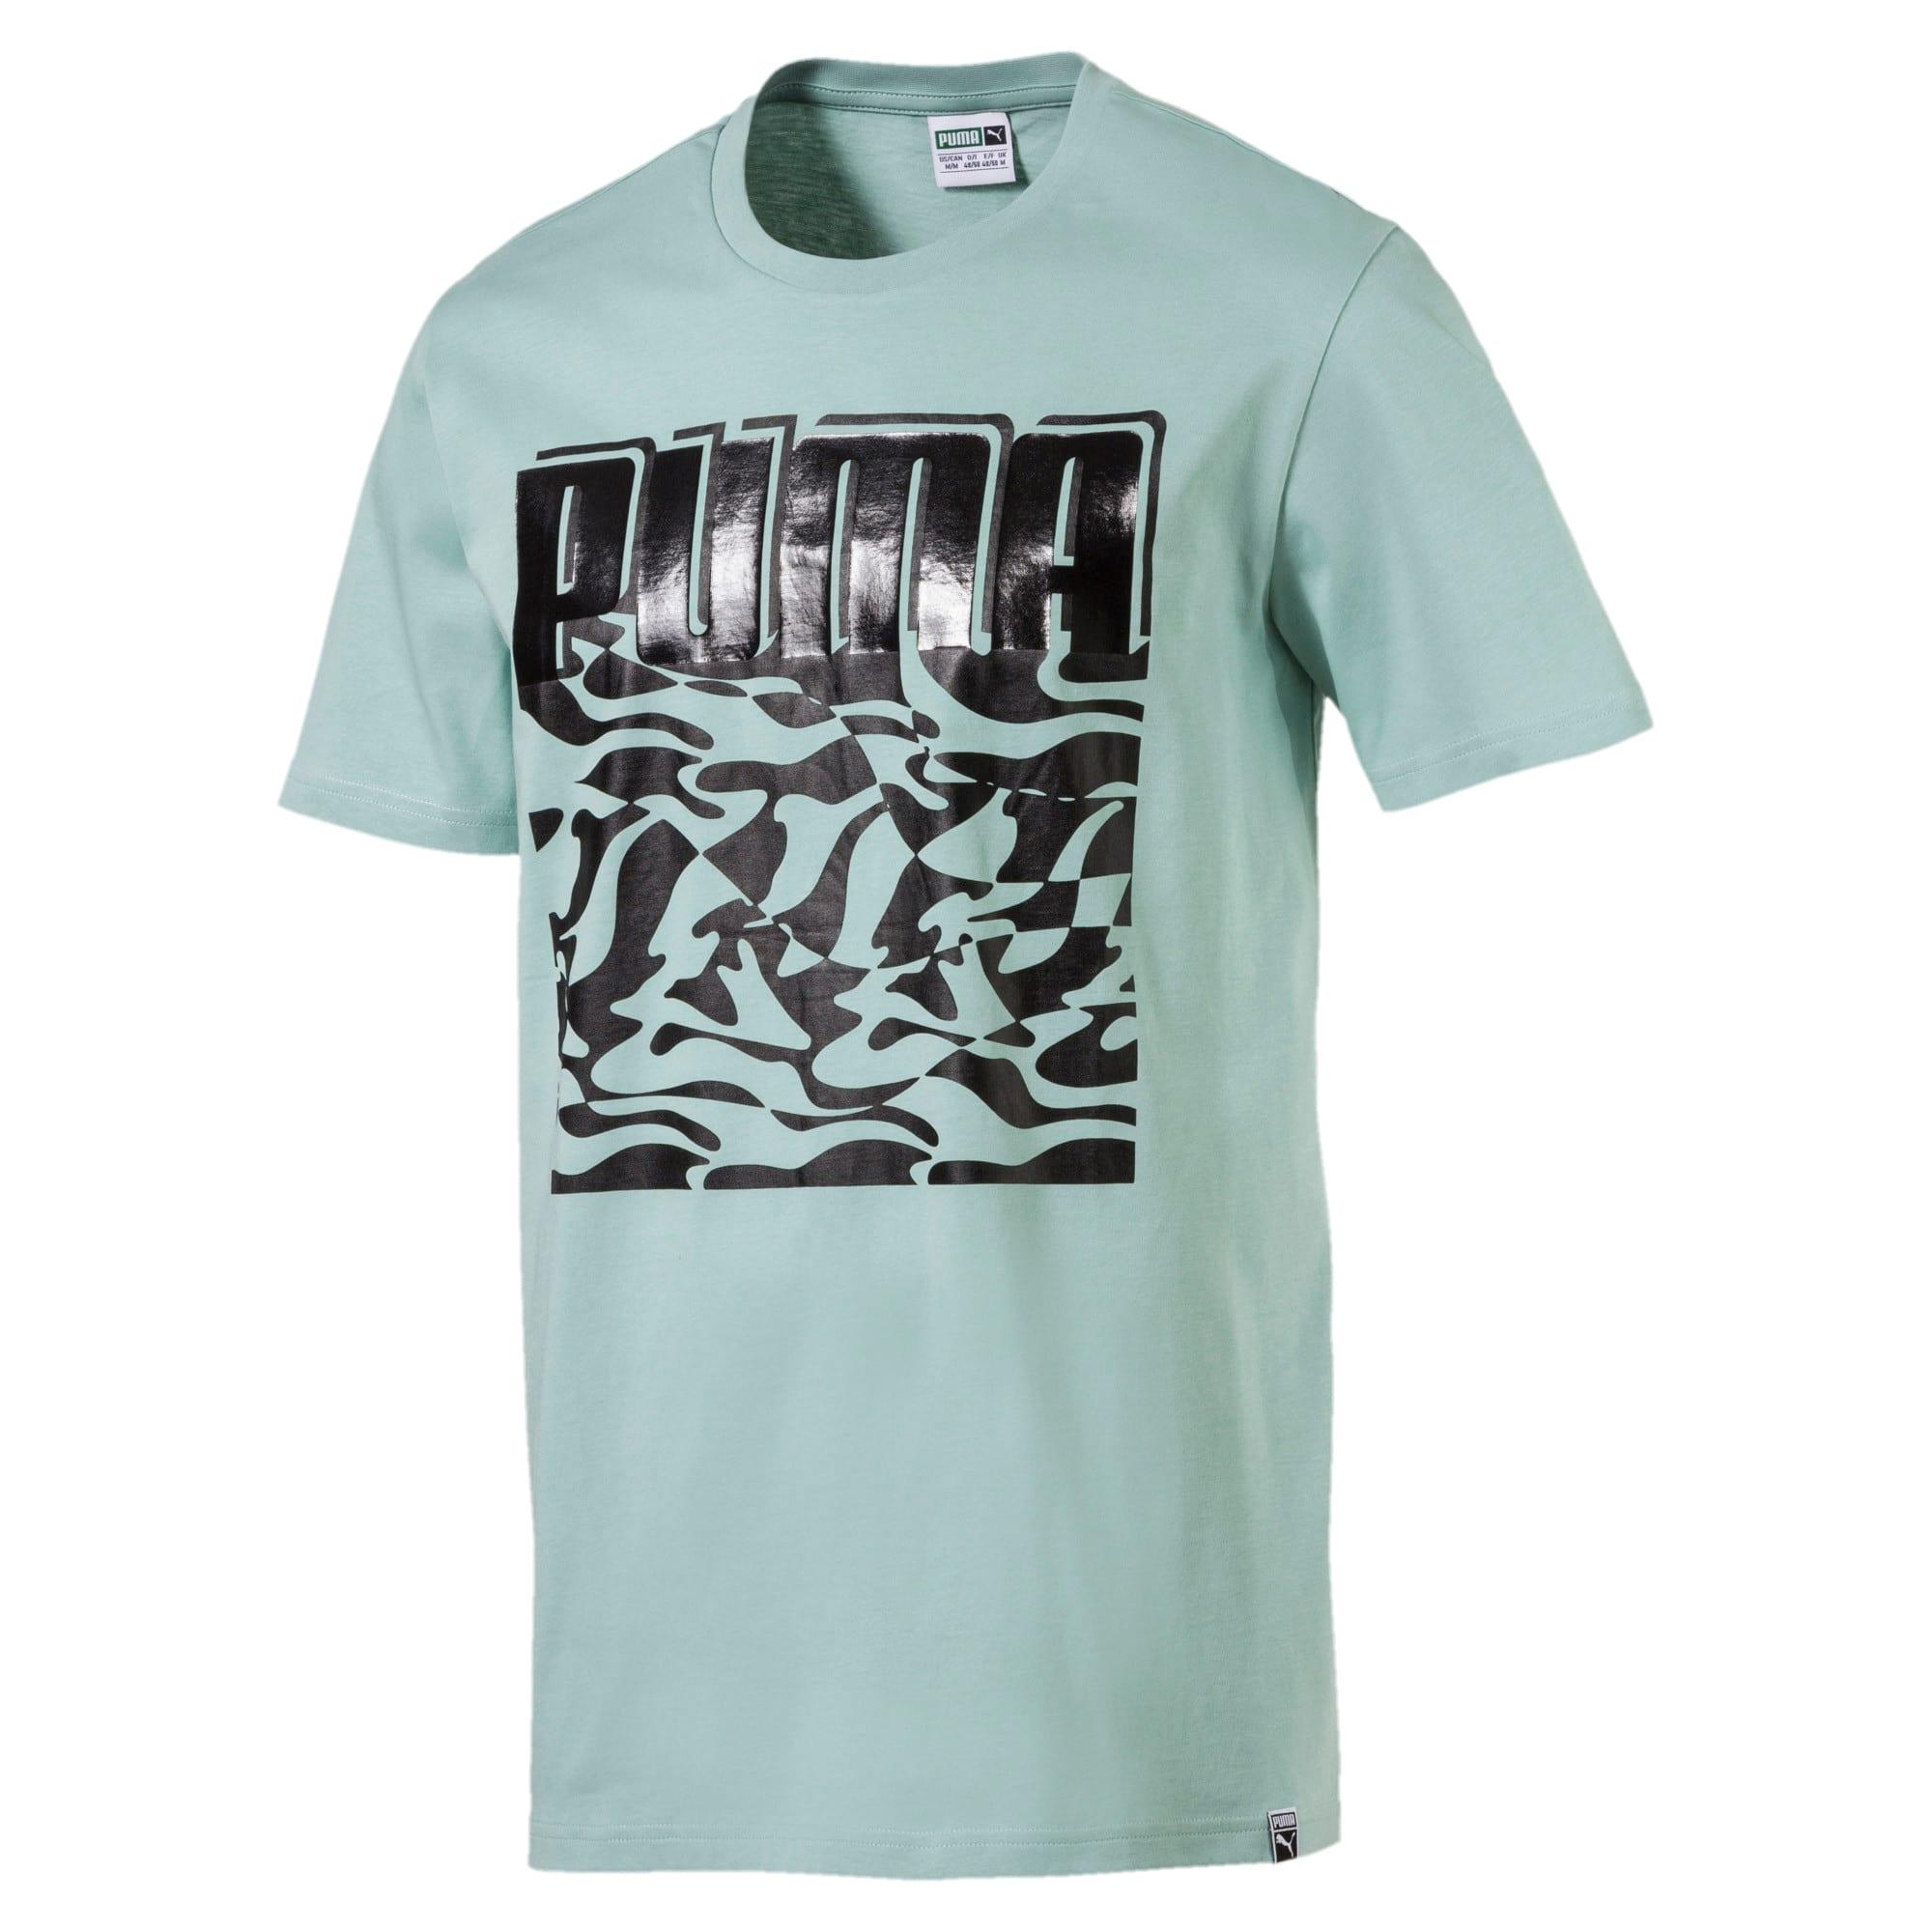 Thumbnail 1 of HD Brand T-Shirt, Aquifer, medium